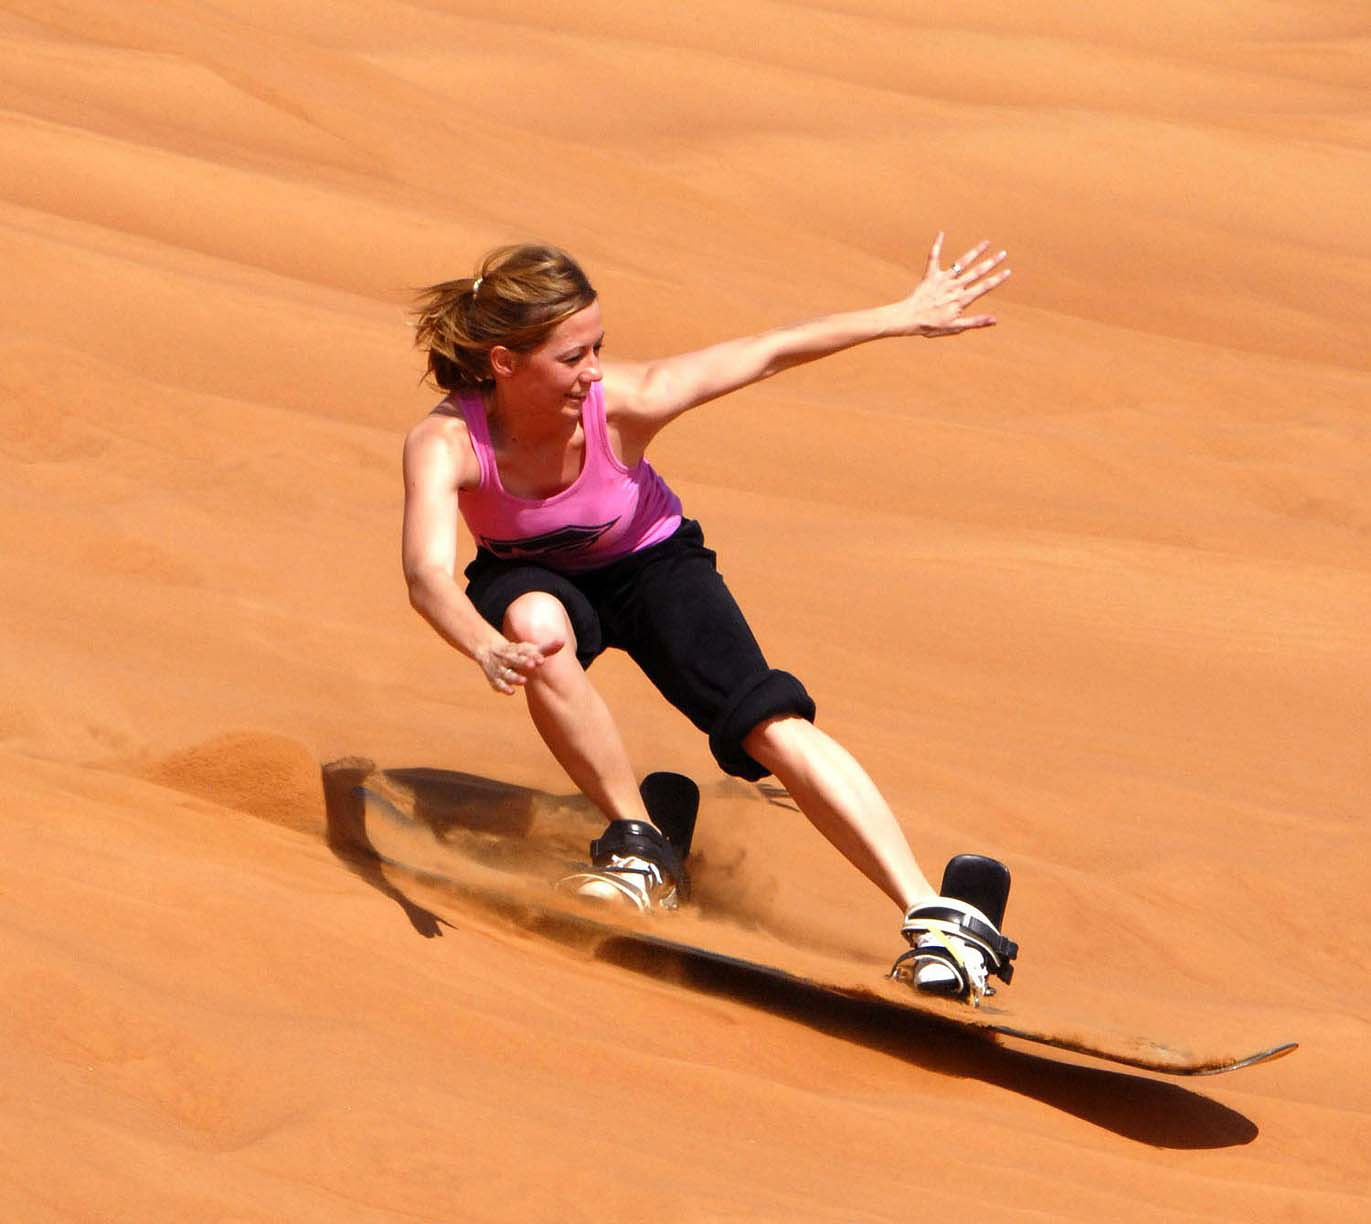 Woman rides a board down a sandy slope.